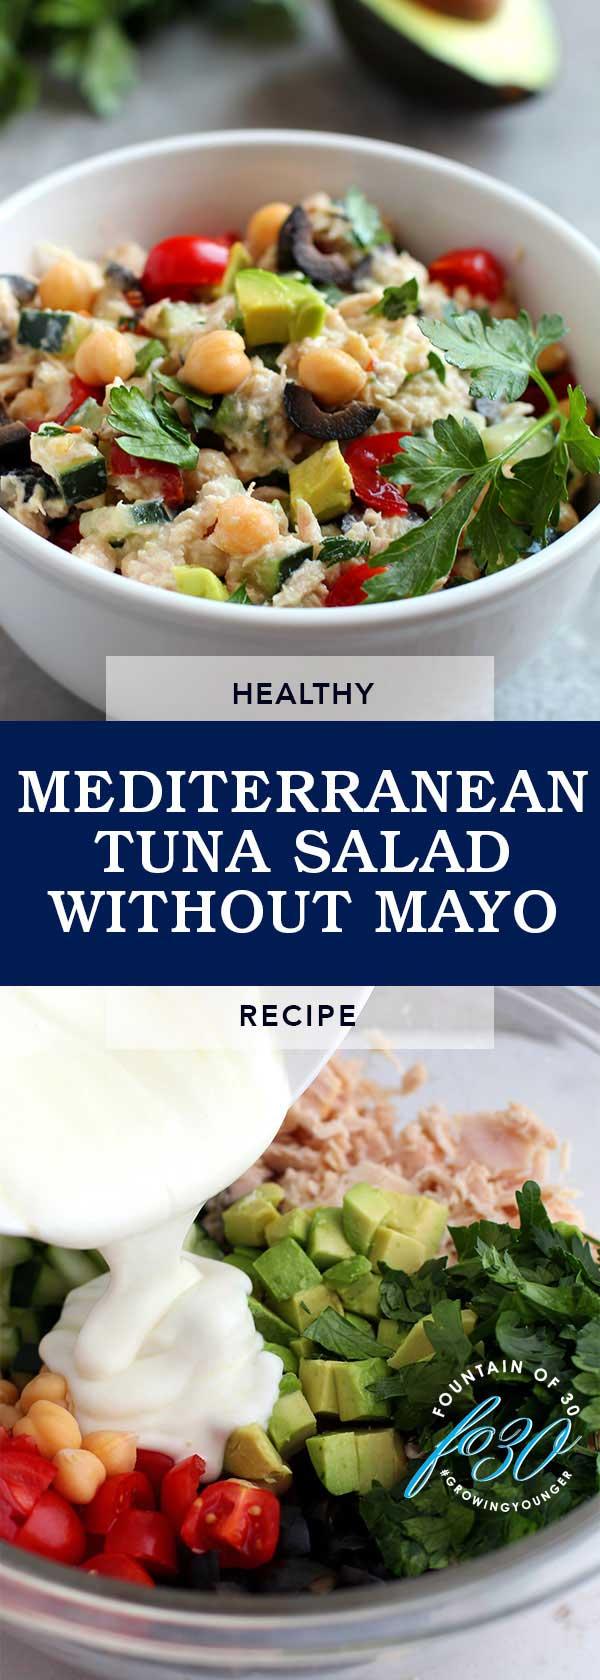 Healthy Mediterranean Tuna Salad without Mayo FountainOf30